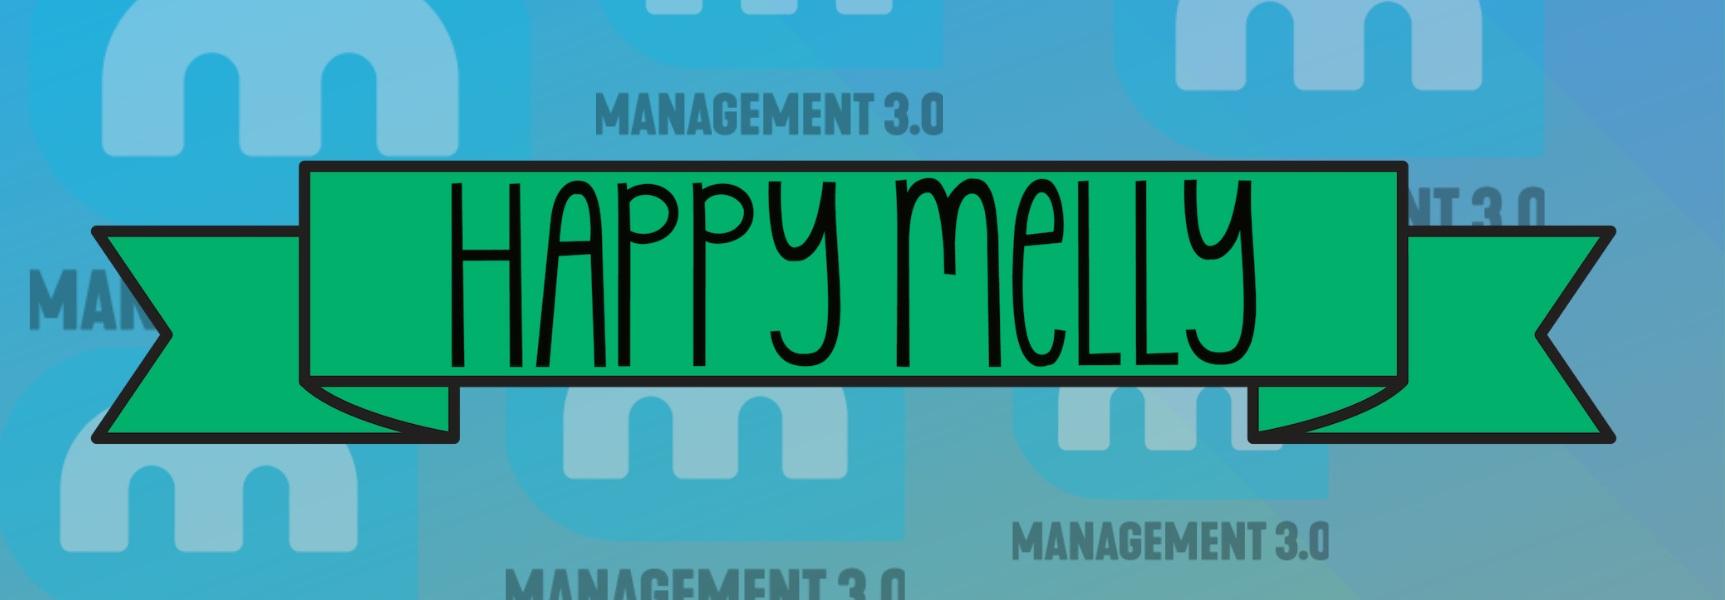 Management 3.0 Badge.png